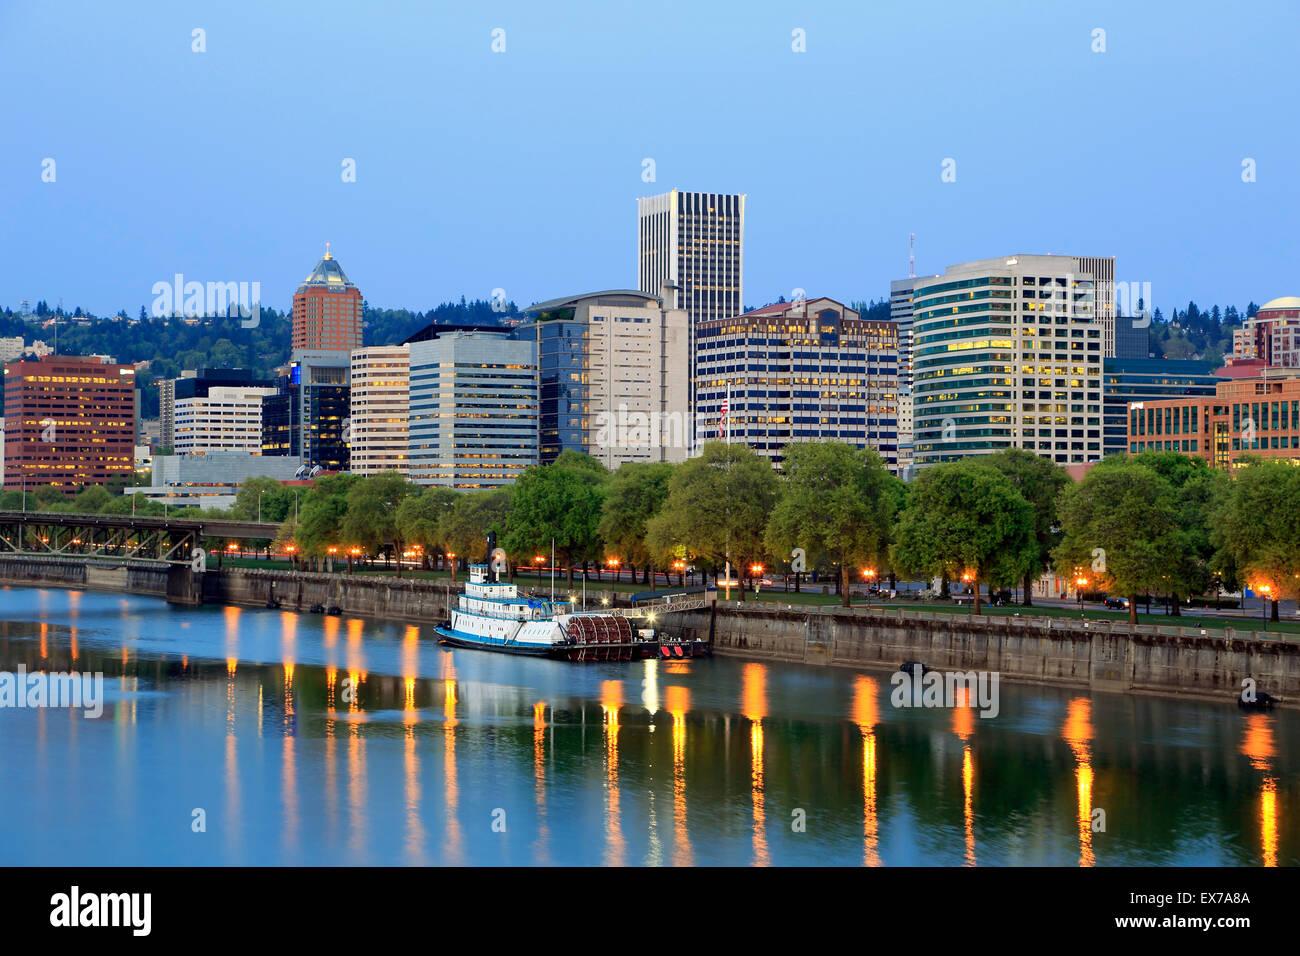 Skyline of Portland and Willamette River, Portland, Oregon USA - Stock Image